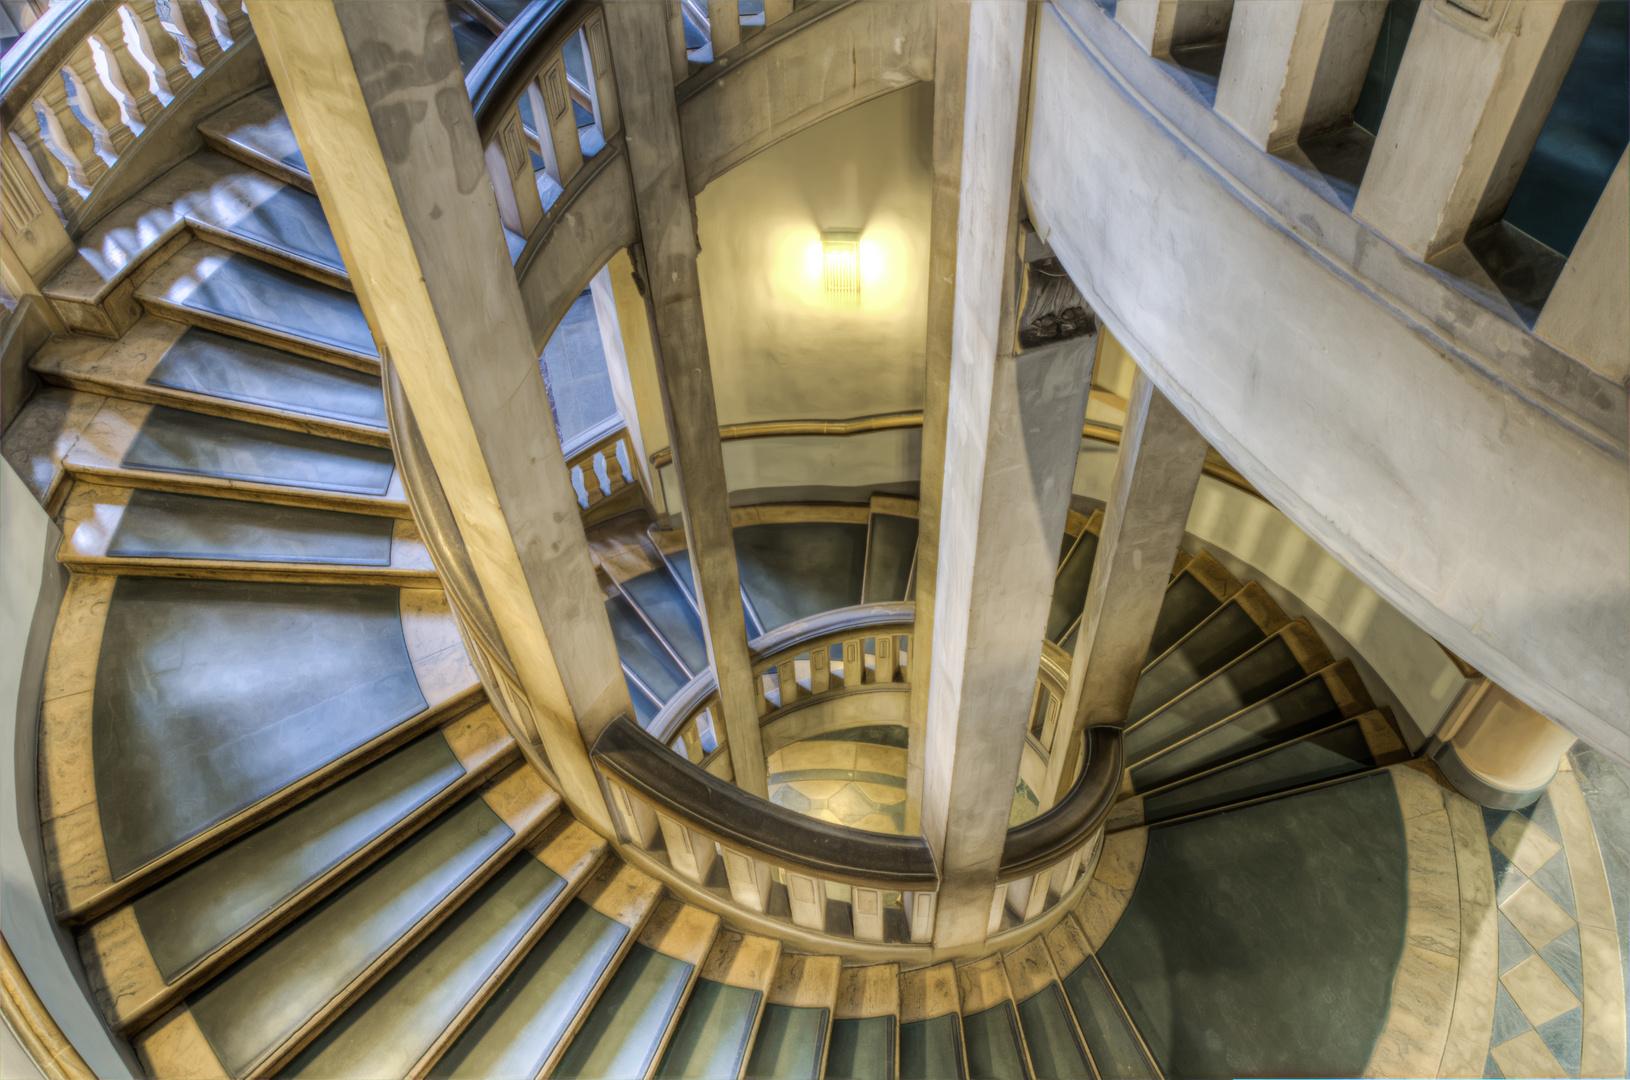 Moderne Architektur In Hannover Foto Bild: Neues Rathaus Hannover / Wendeltreppe Foto & Bild